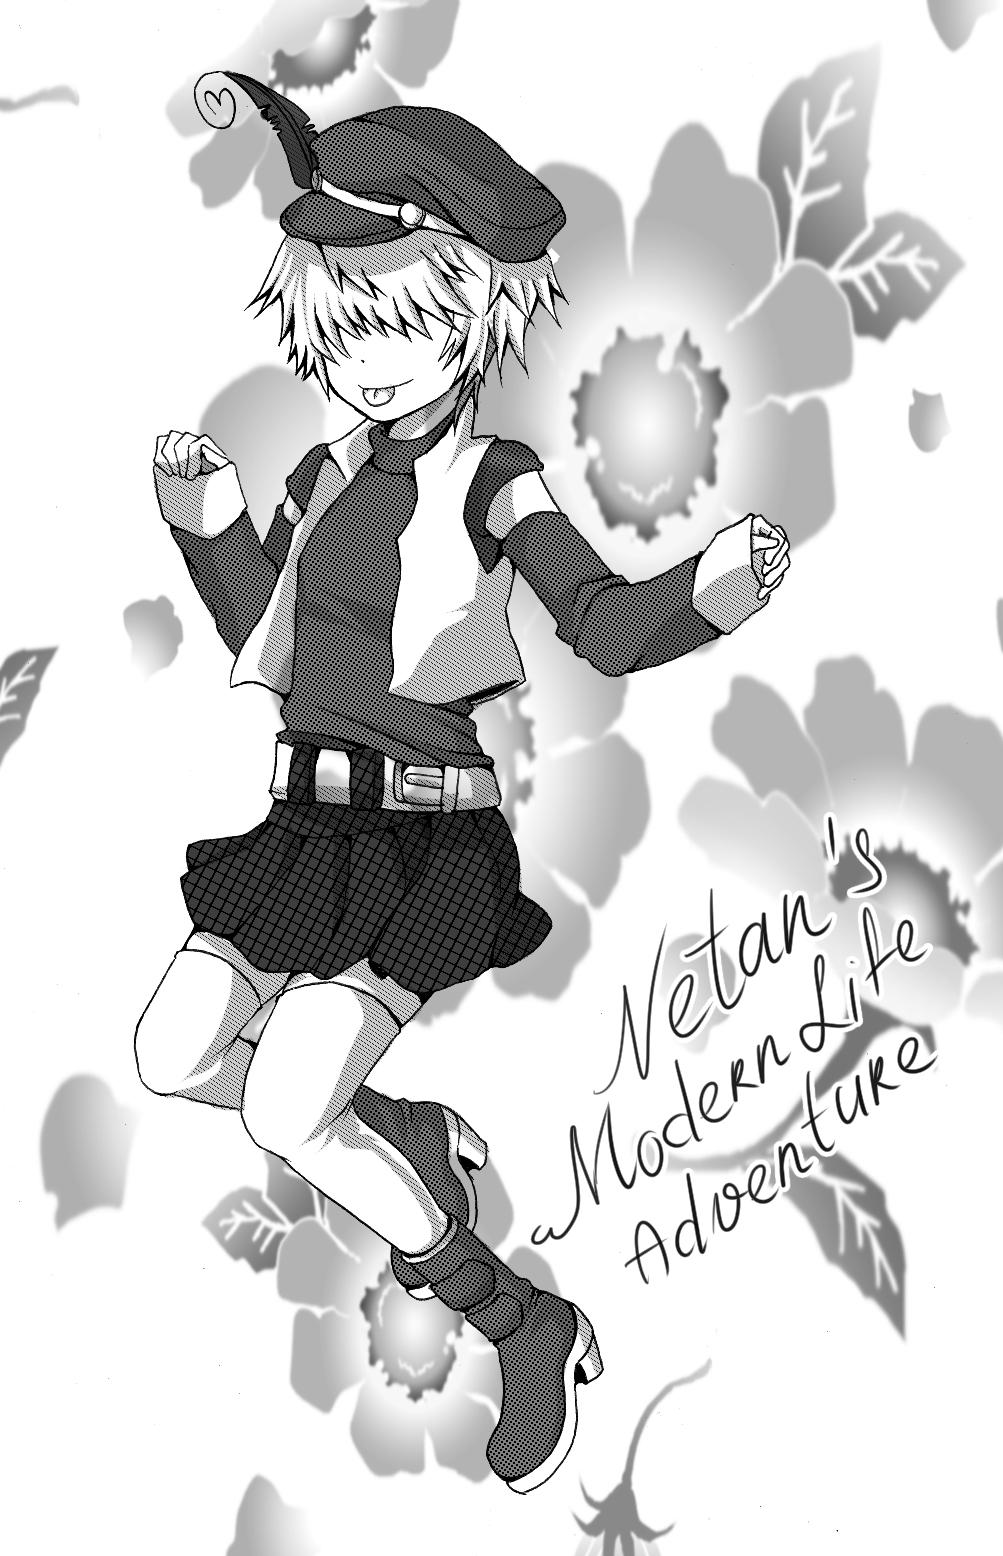 [MH] - Netan's Modern Life Adventure by TanoshiiBaka96